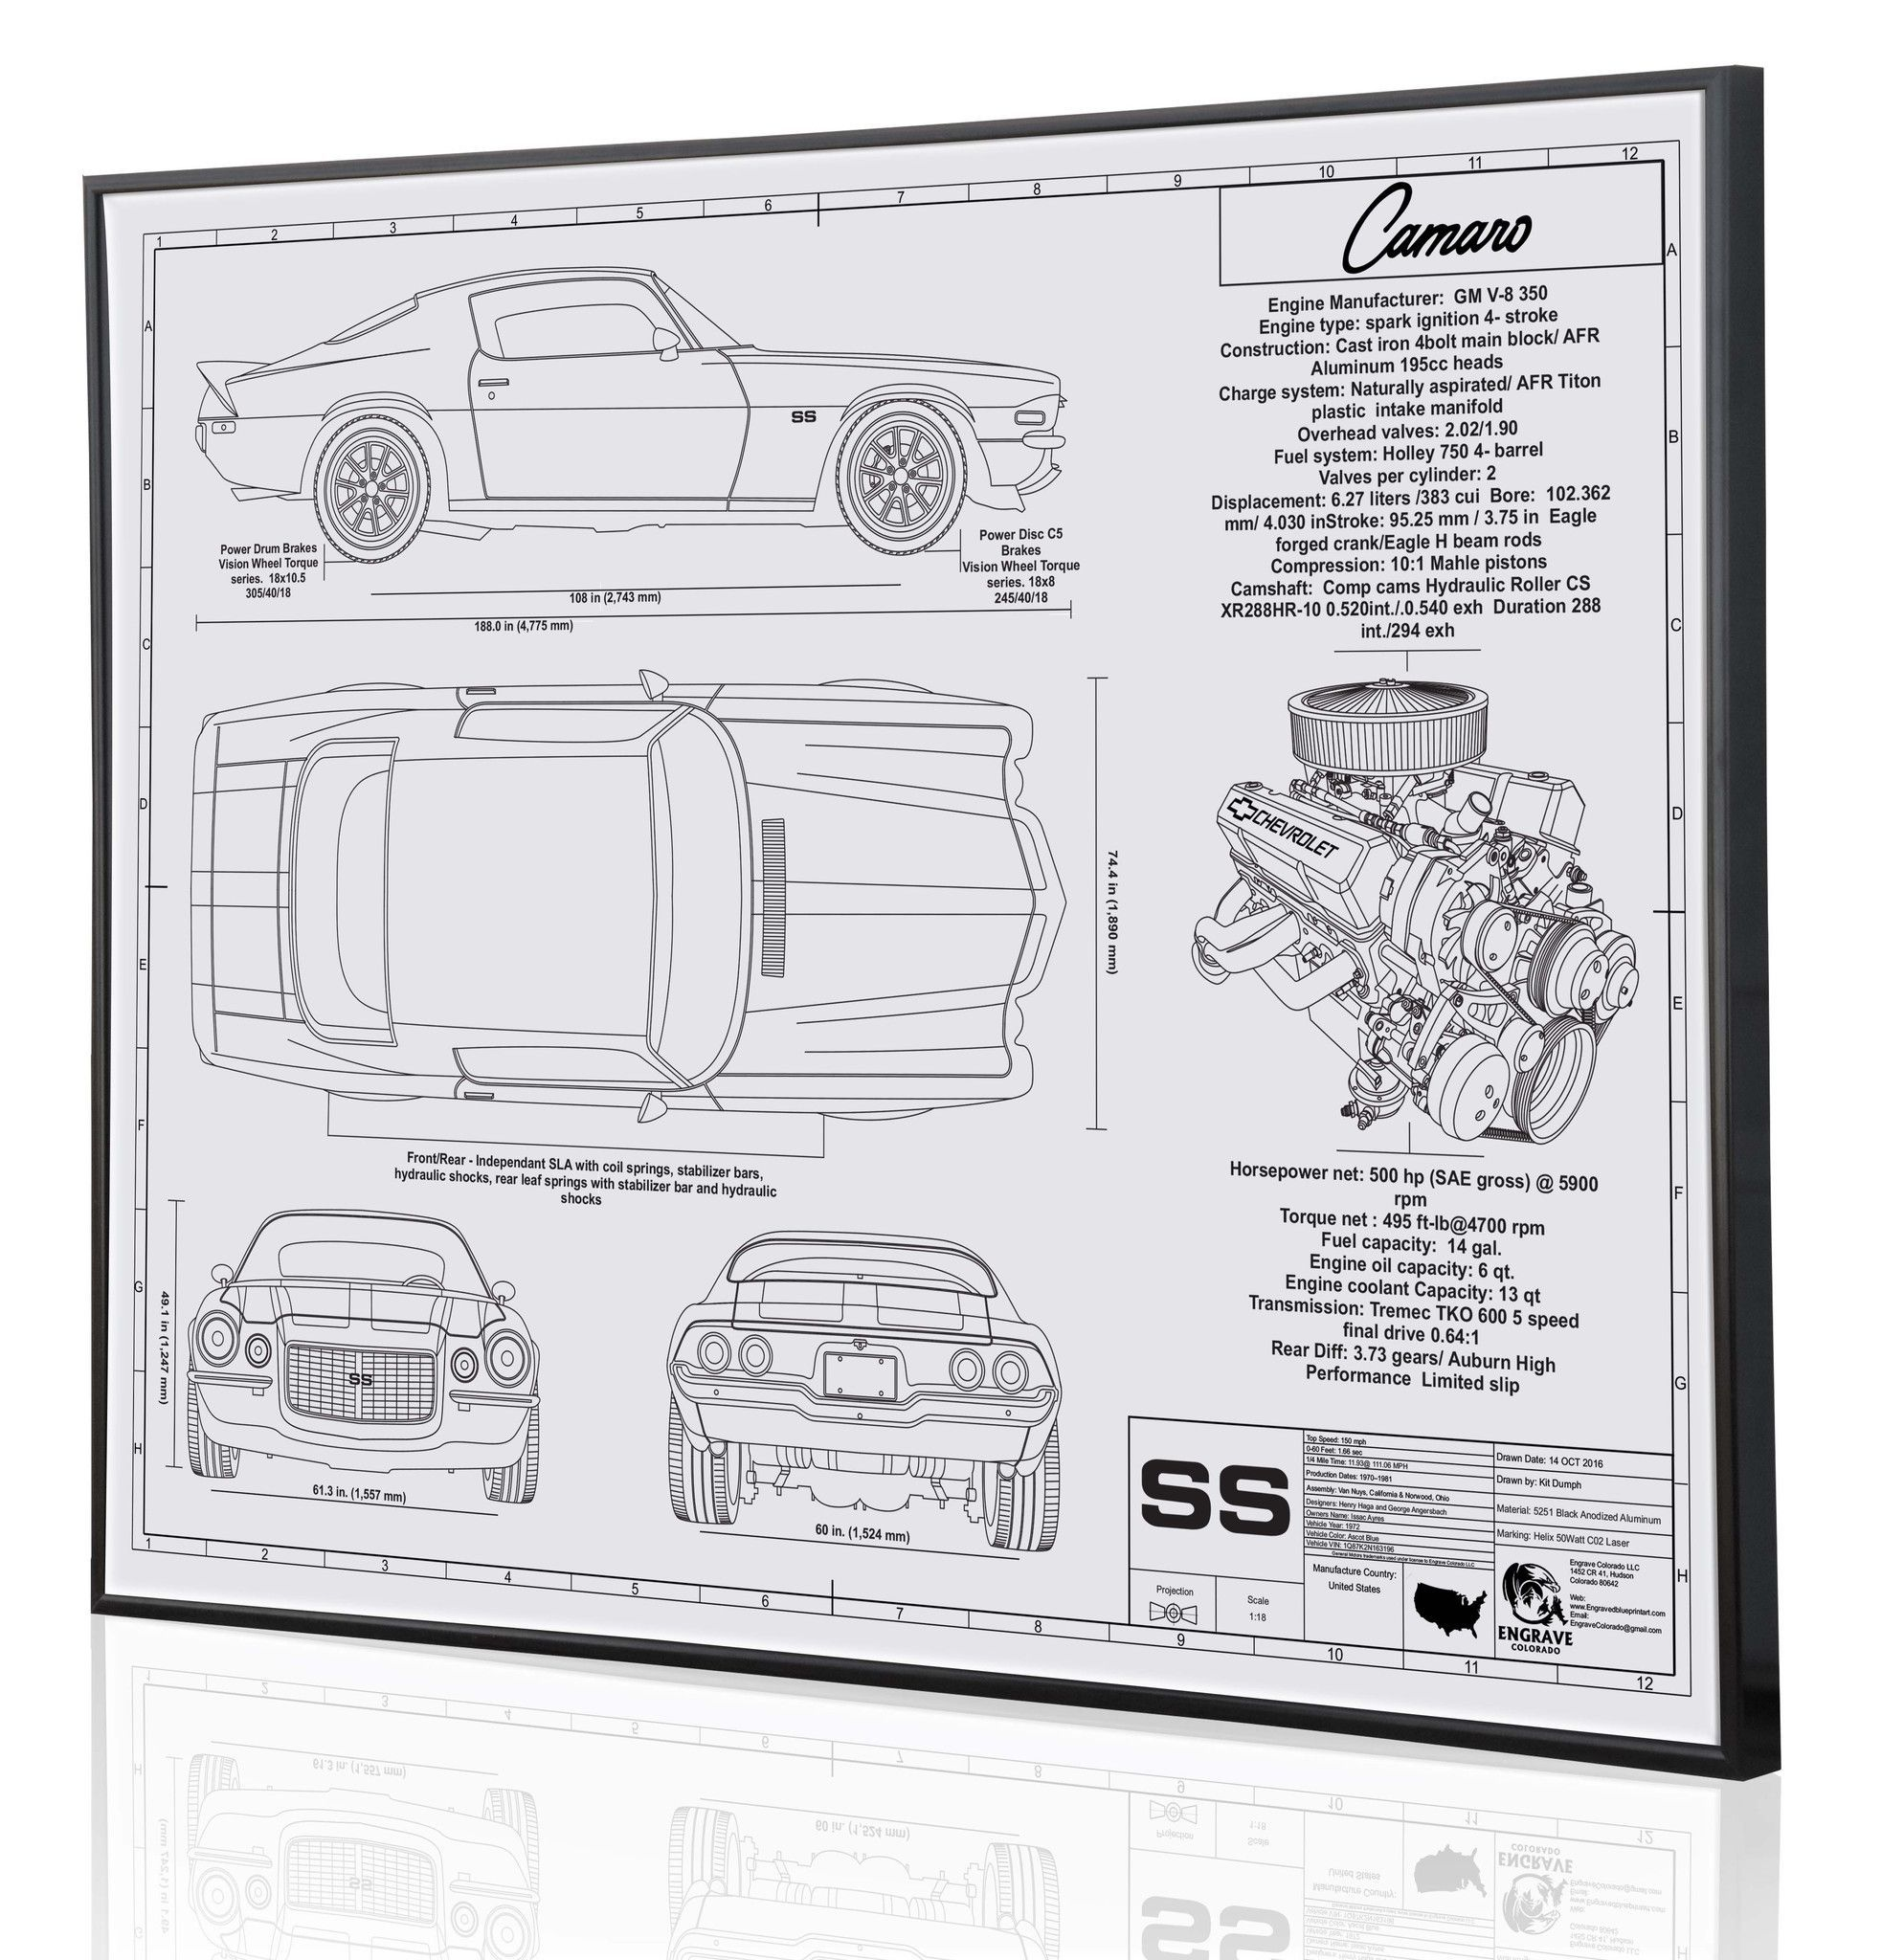 chiltons electronic engine controls manual 1992 alfa romeo audi bmw jaguar mercedes benz merkur peugeot porsche saab sterling volkswagen manual european cars and light trucks